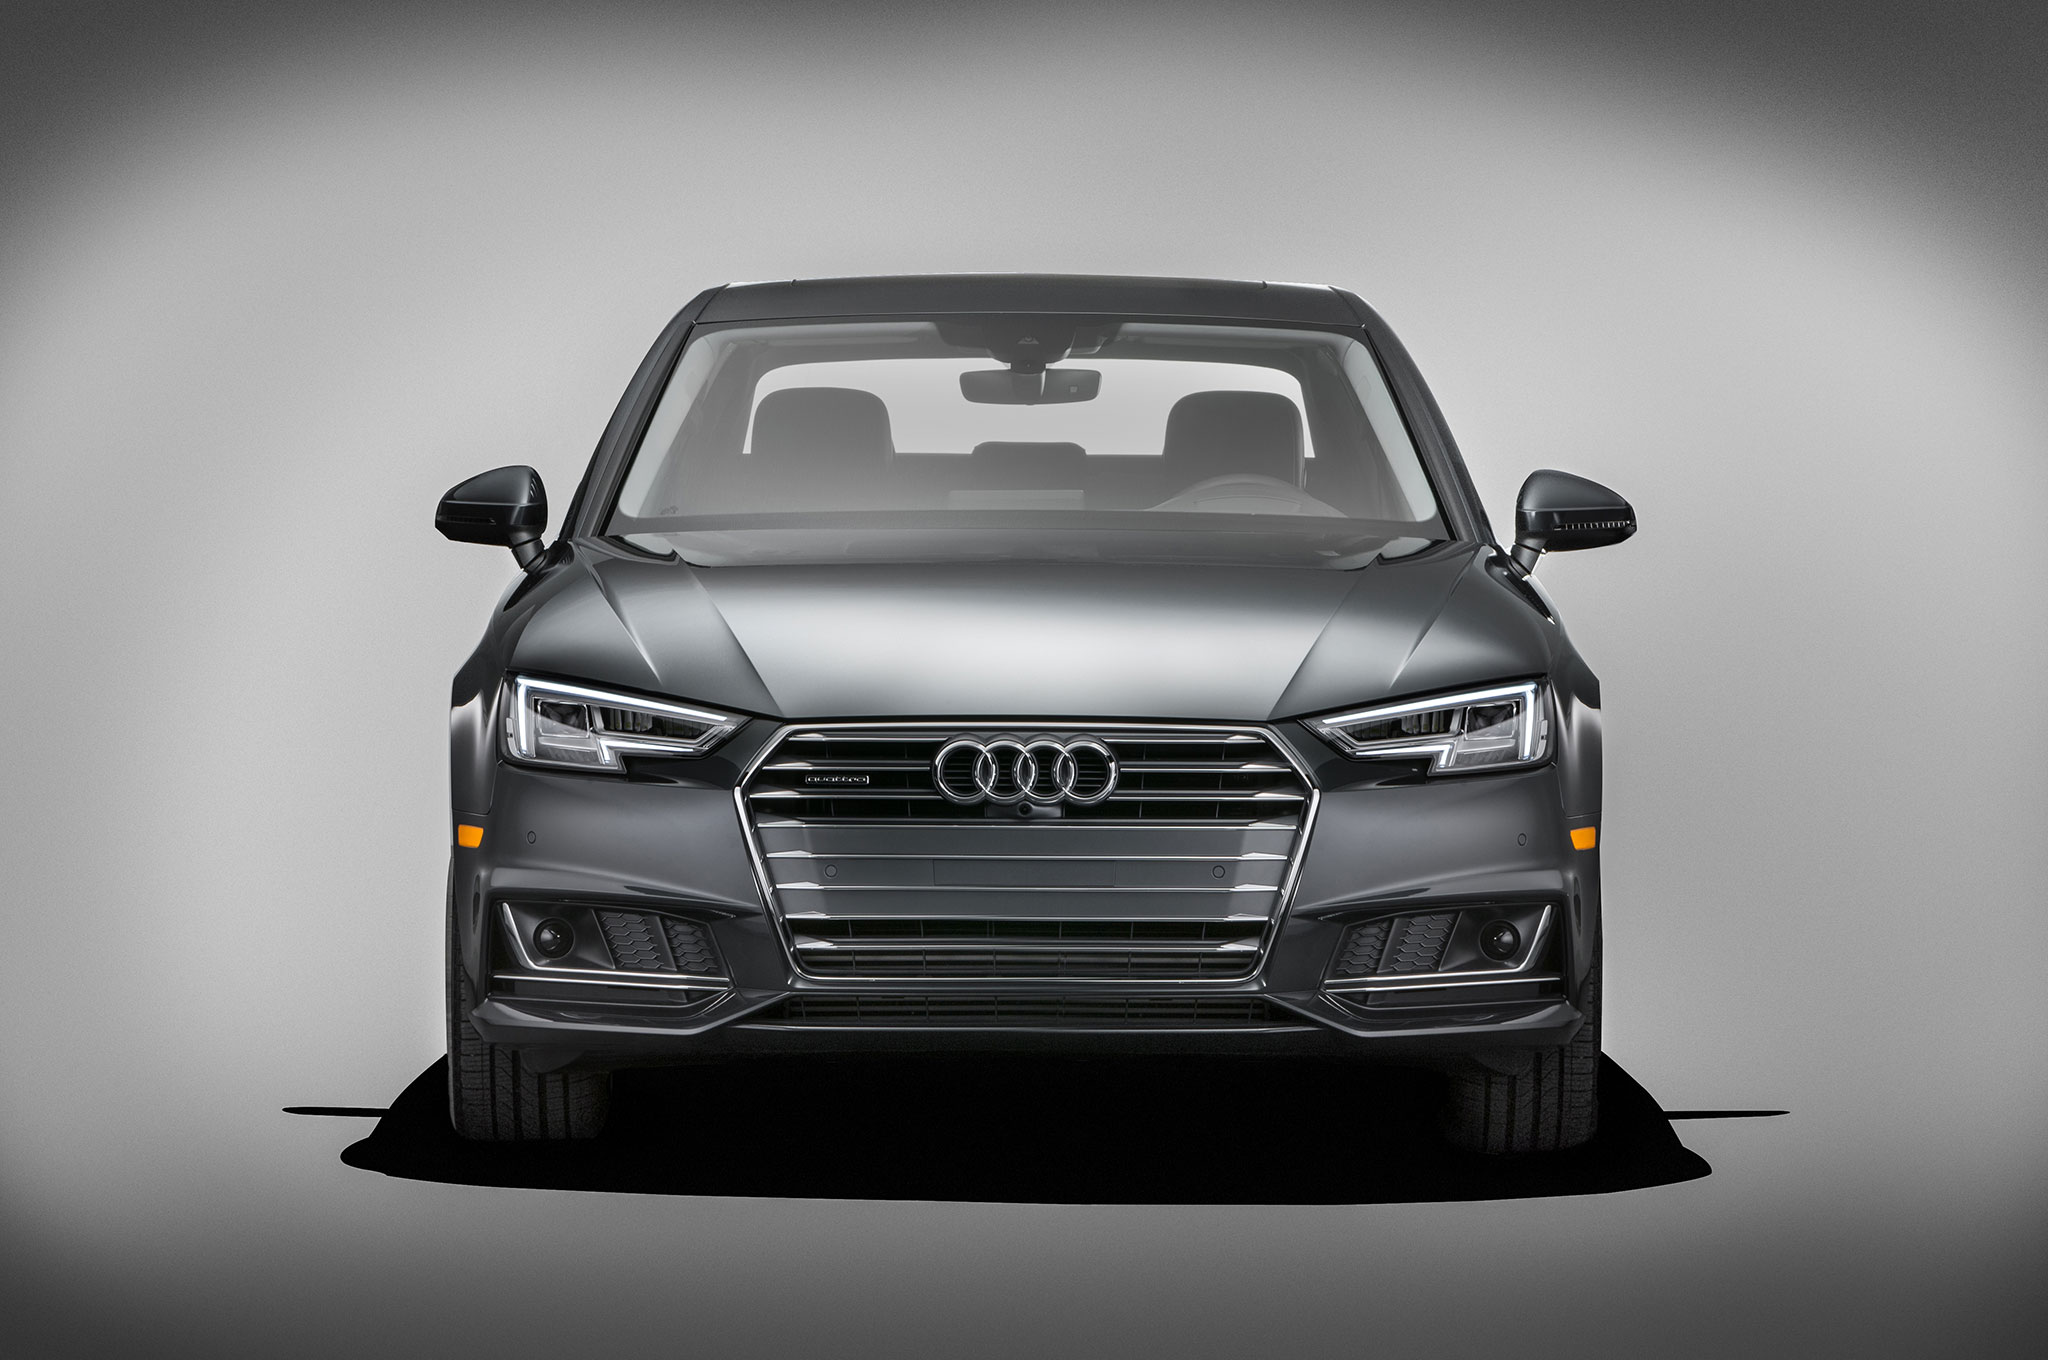 2017 Audi A4 20t Tfsi Quattro Review